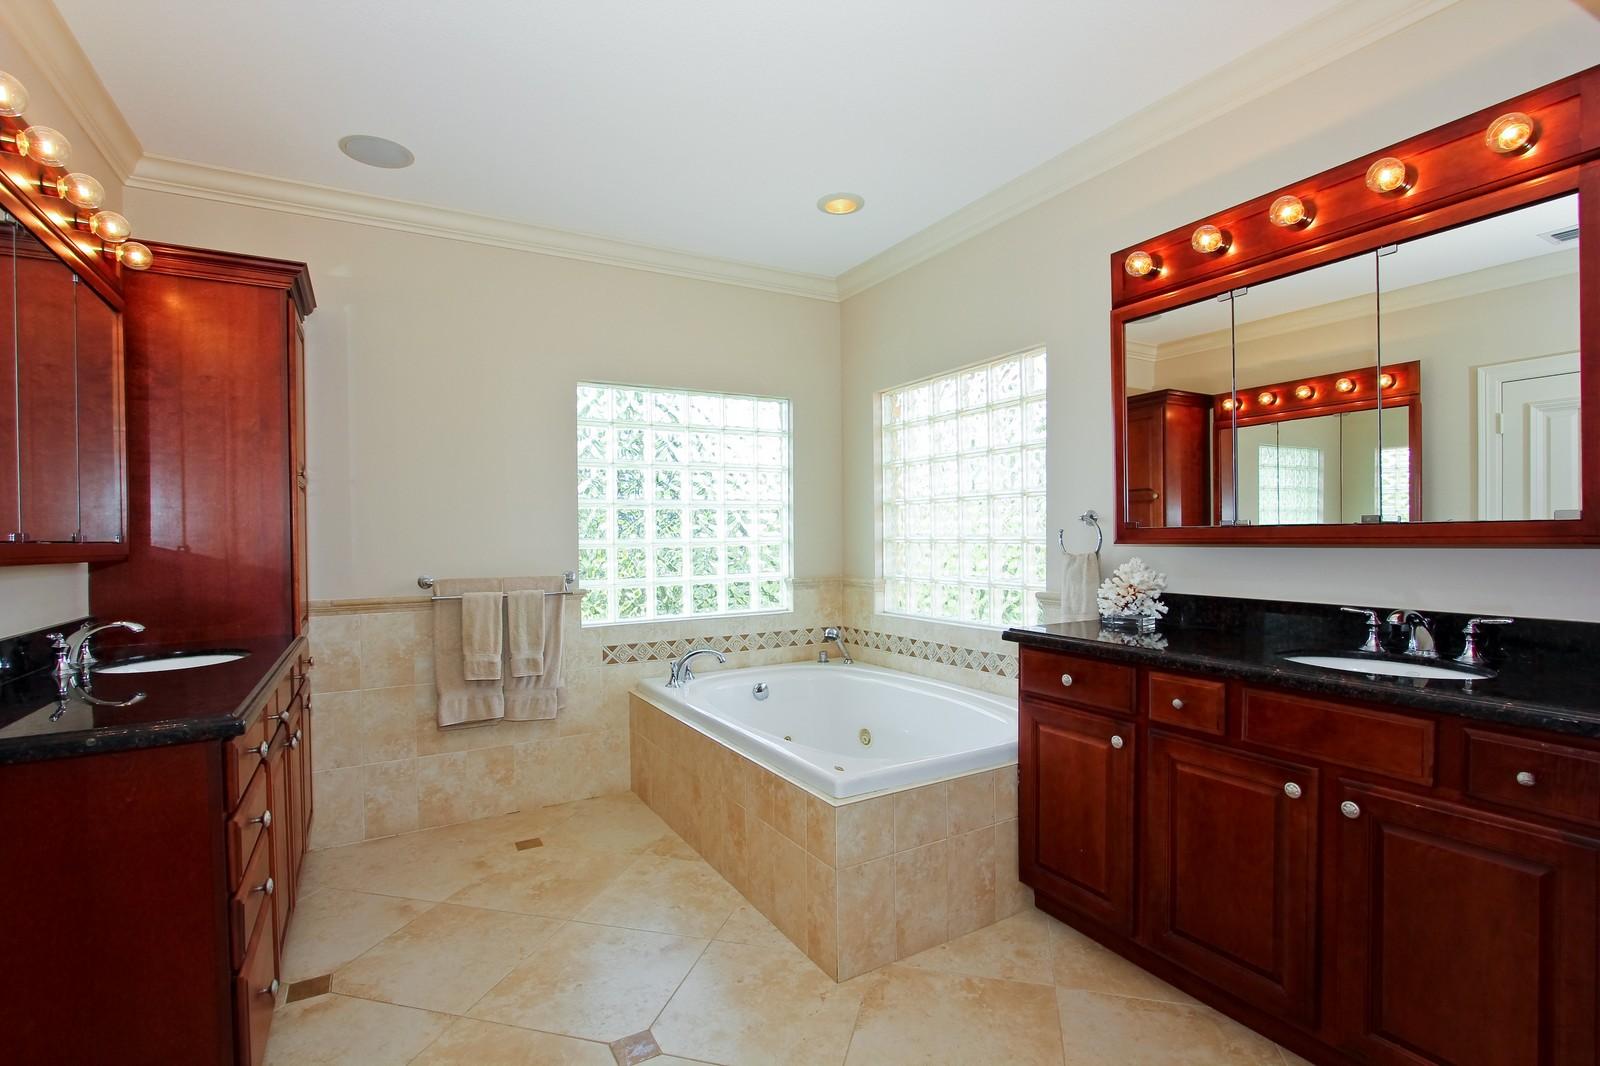 Real Estate Photography - 430 N. Lyra Circle, Juno Beach, FL, 33408 - Master Bathroom